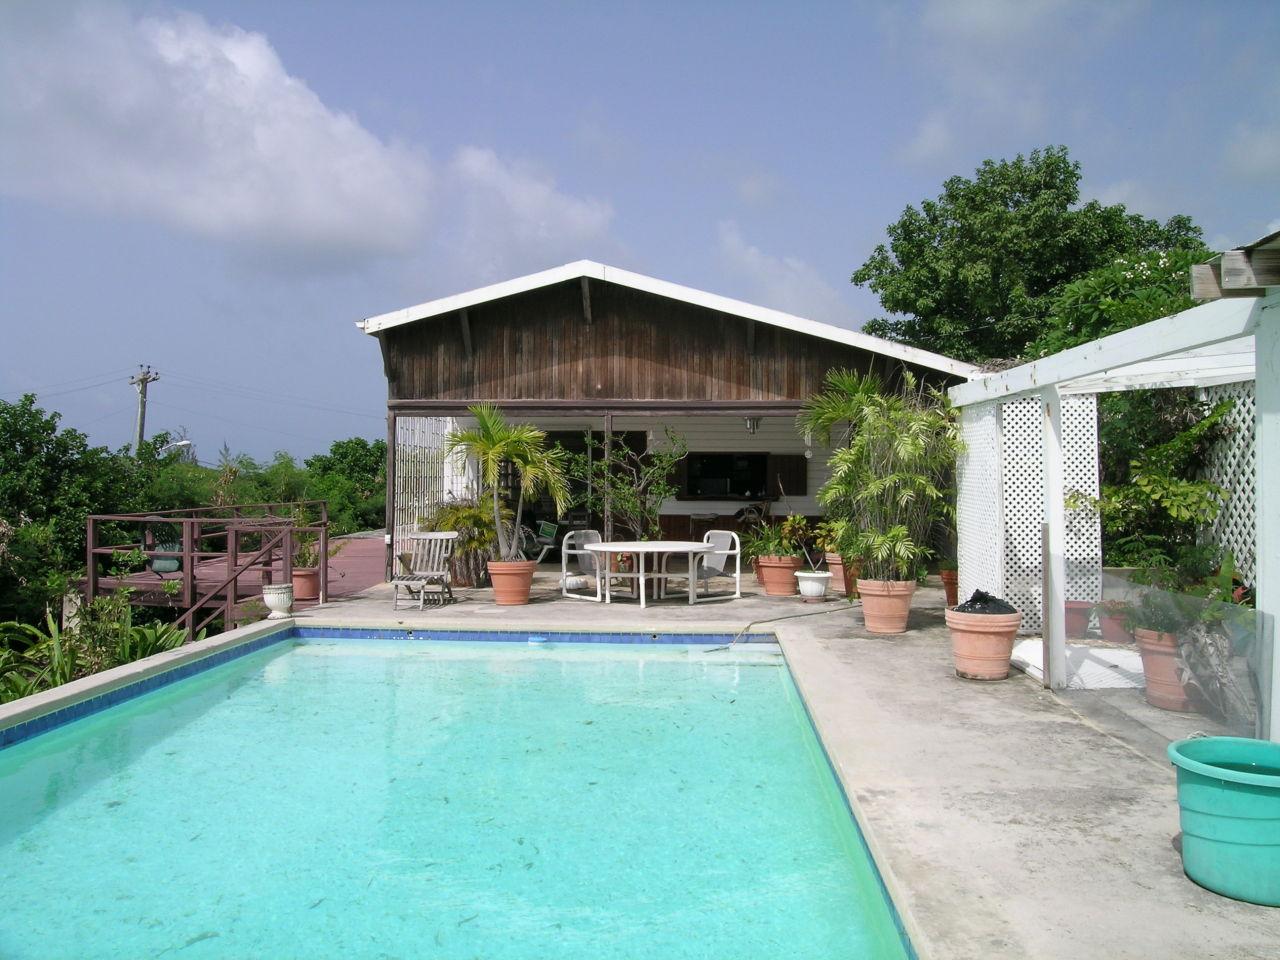 Photo of 86-3,86-4  Cruz Bay Town